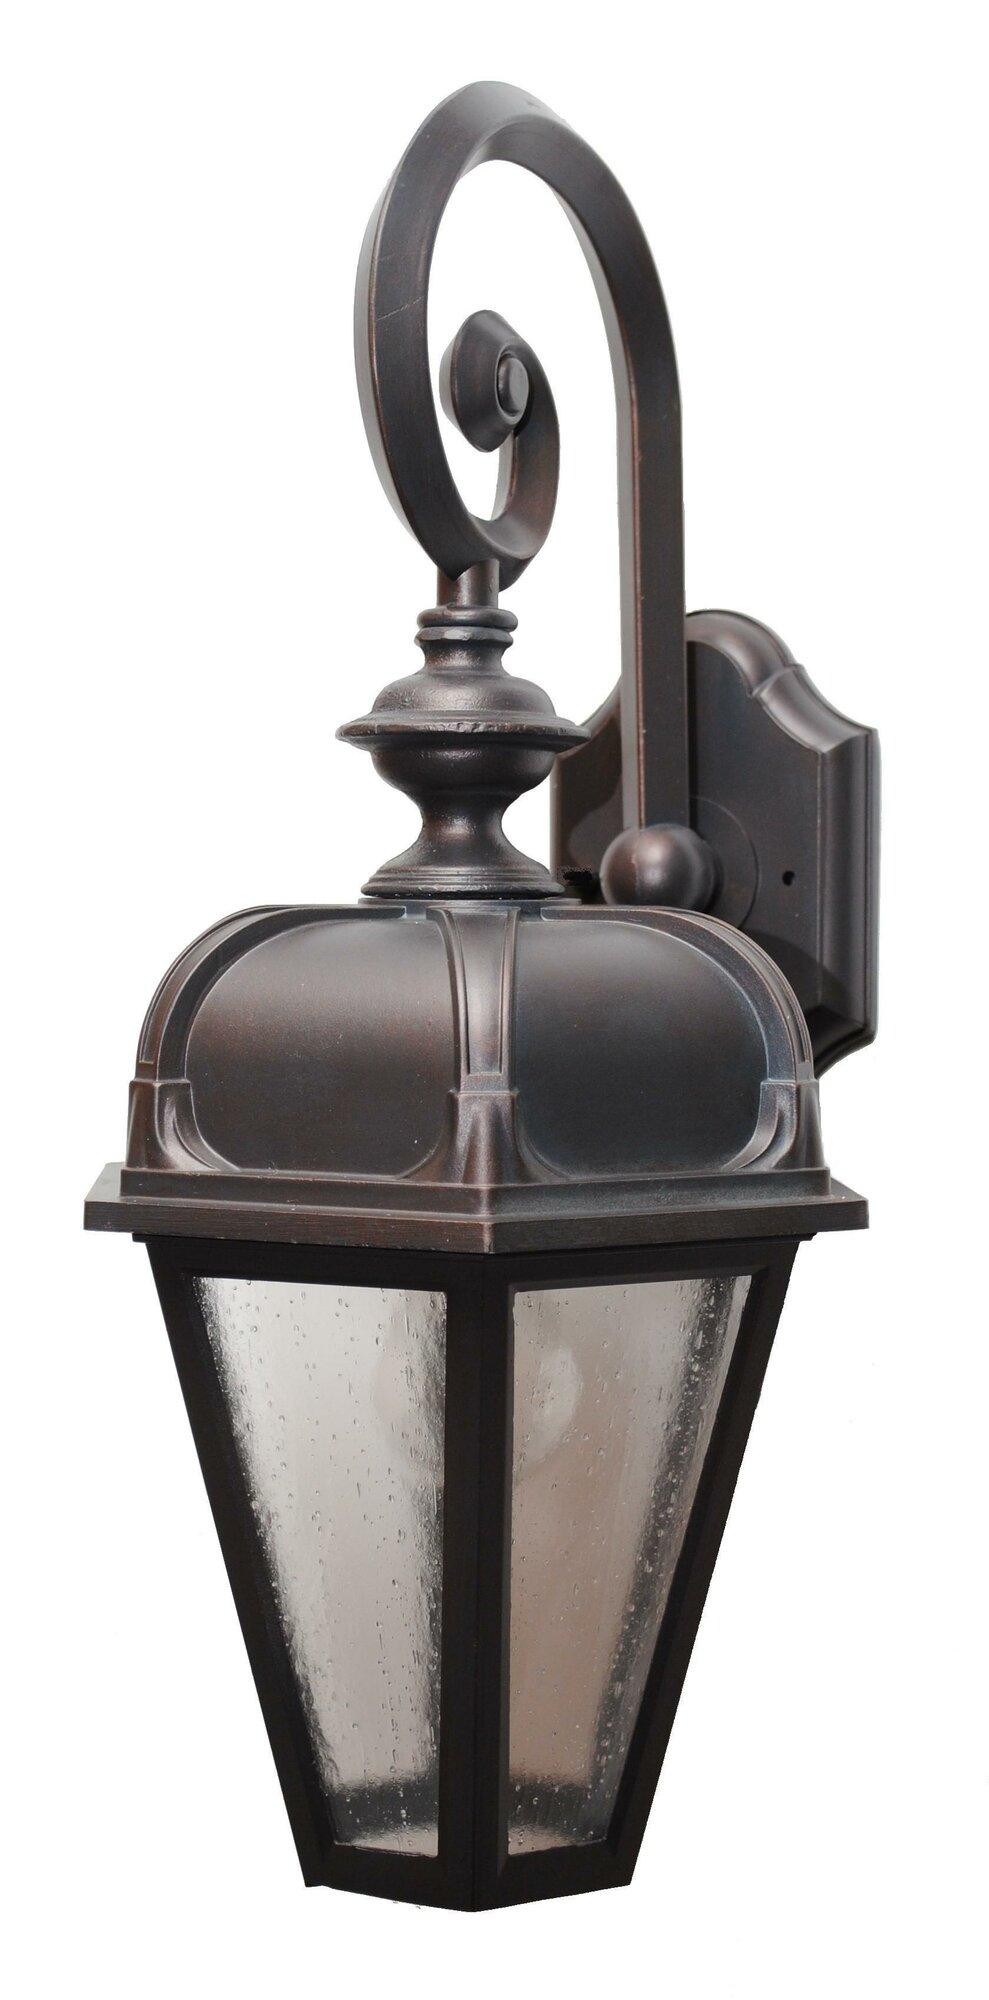 Melissa Lighting Kiss Series 1 Light Outdoor Wall Lantern EBay